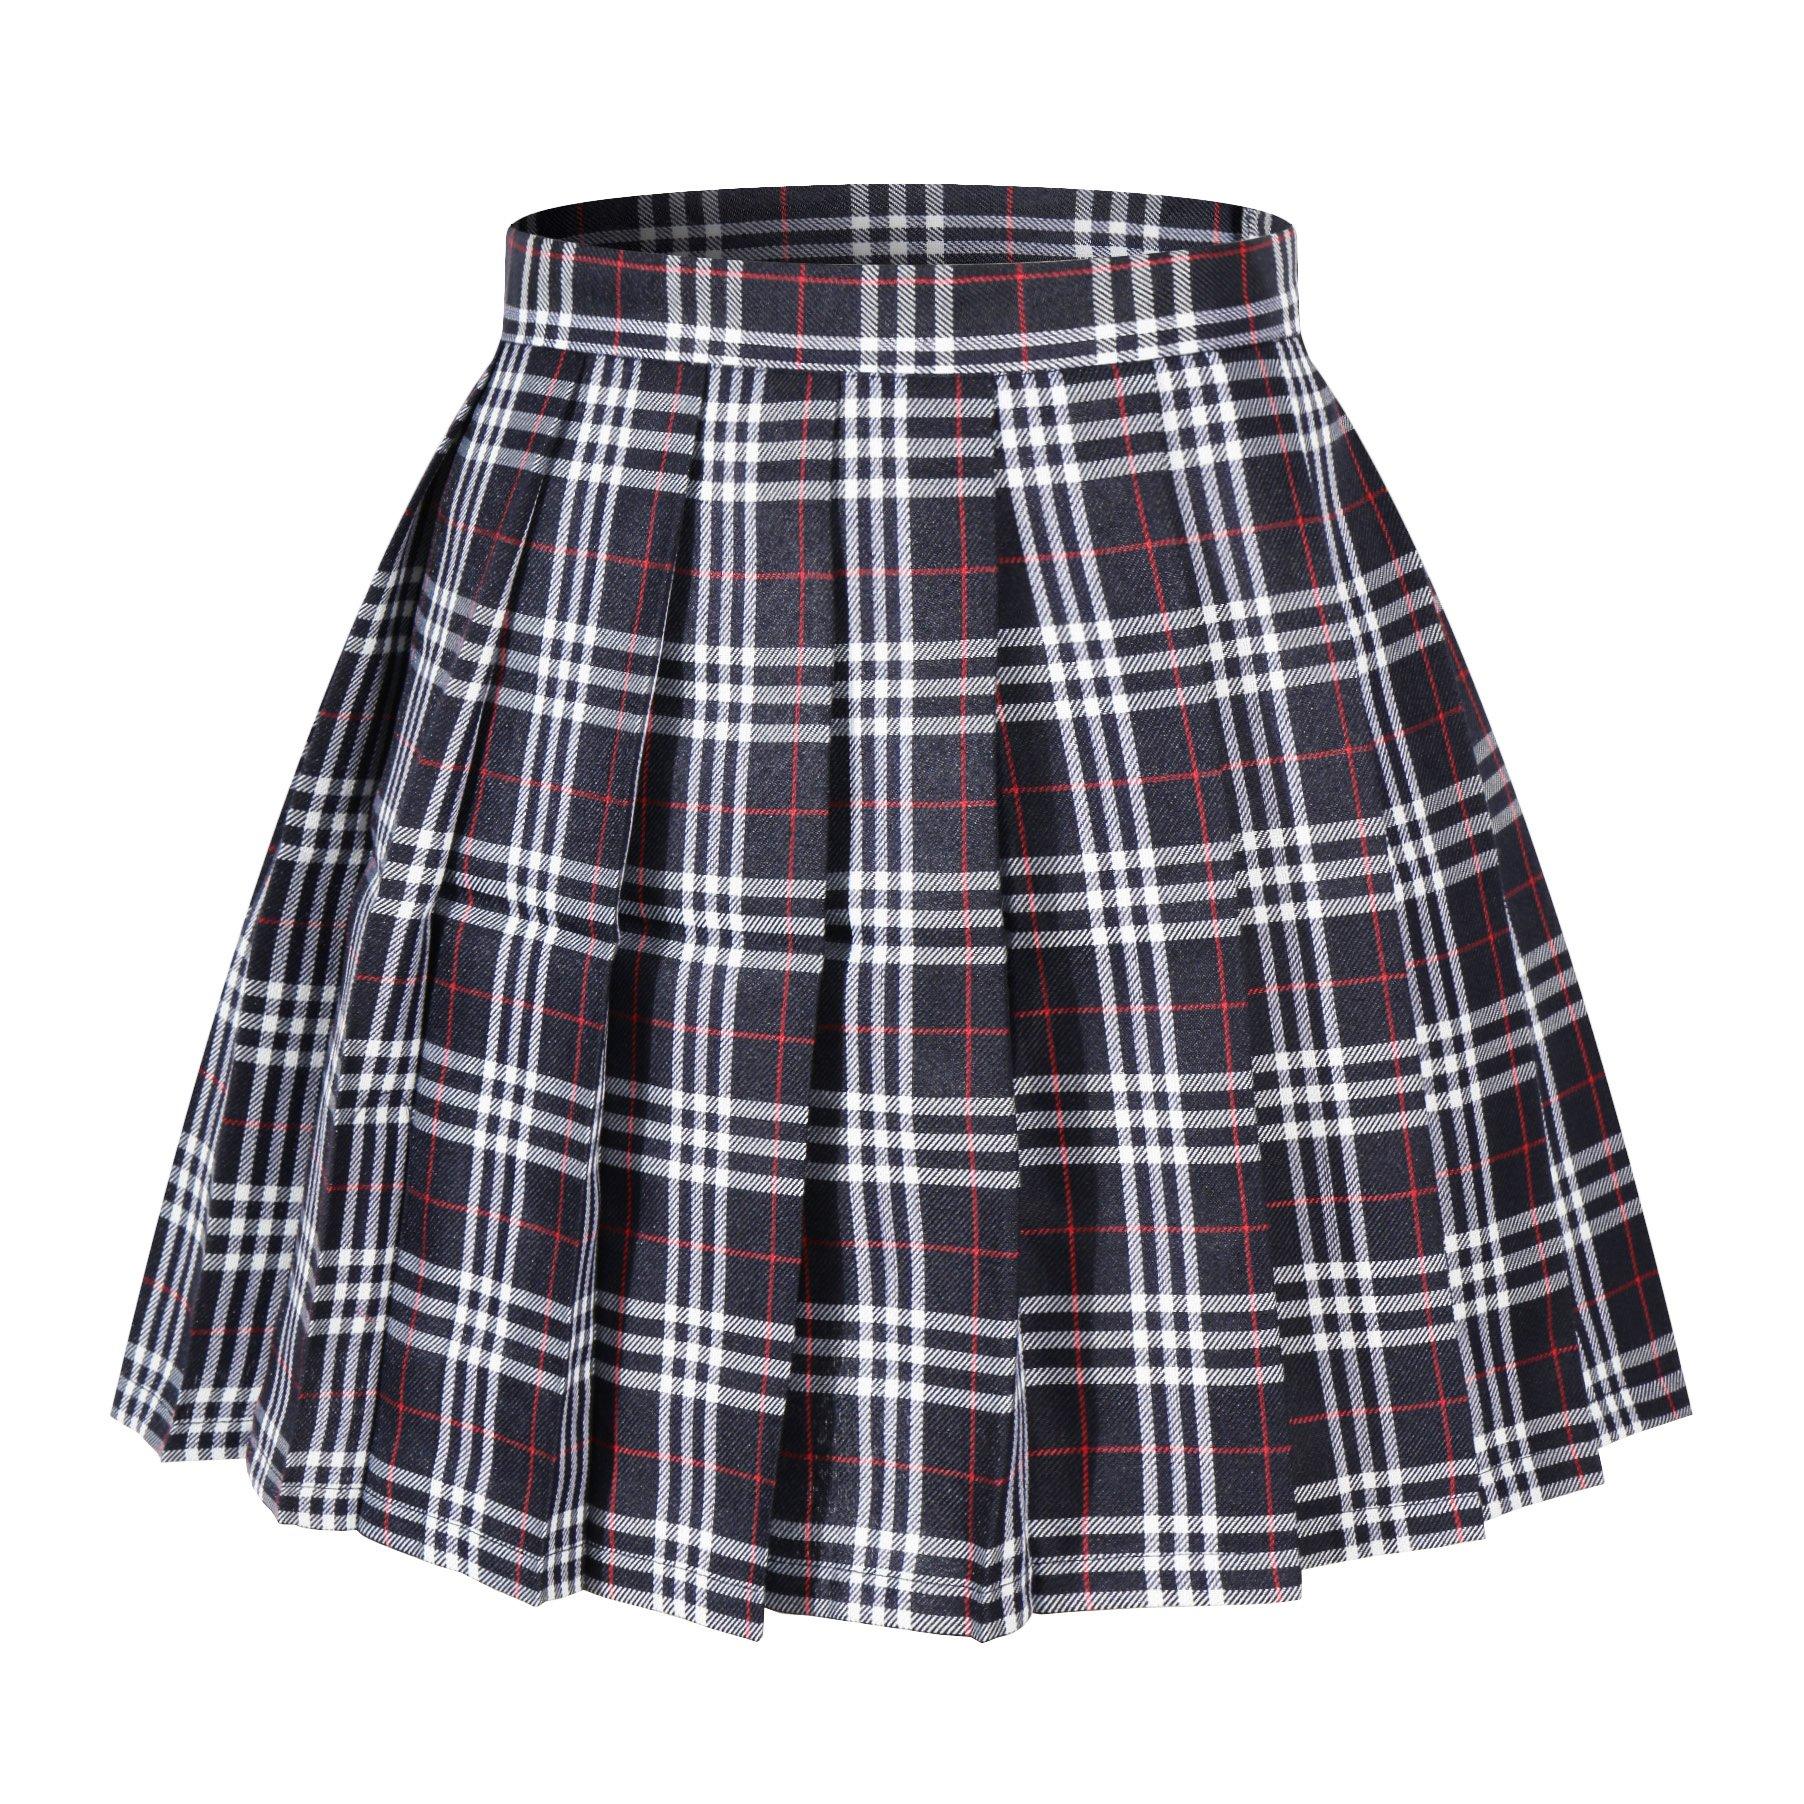 Beautifulfashionlife Girl's A-Line Kilt Plaid Pleated Skirts (XS,Dark Blue Mixed White)